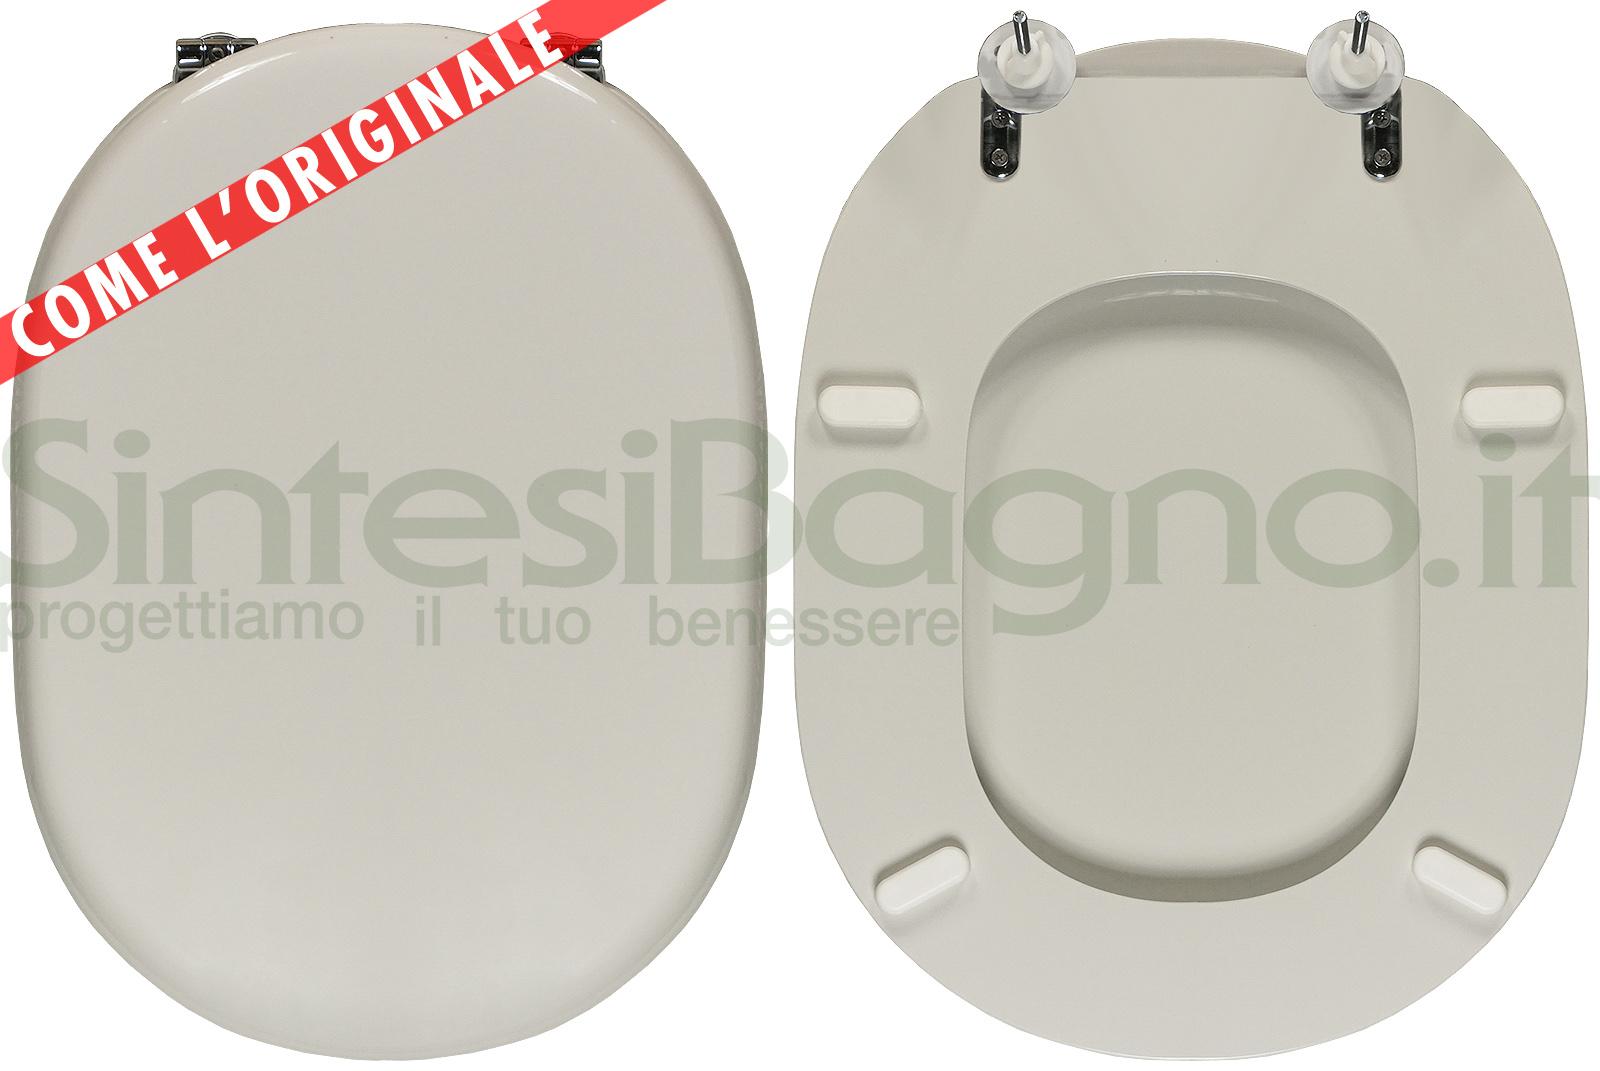 Wc Seat Fiorile Ideal Standard Model Standard White Type Like Original Sintesibagno Shop Online